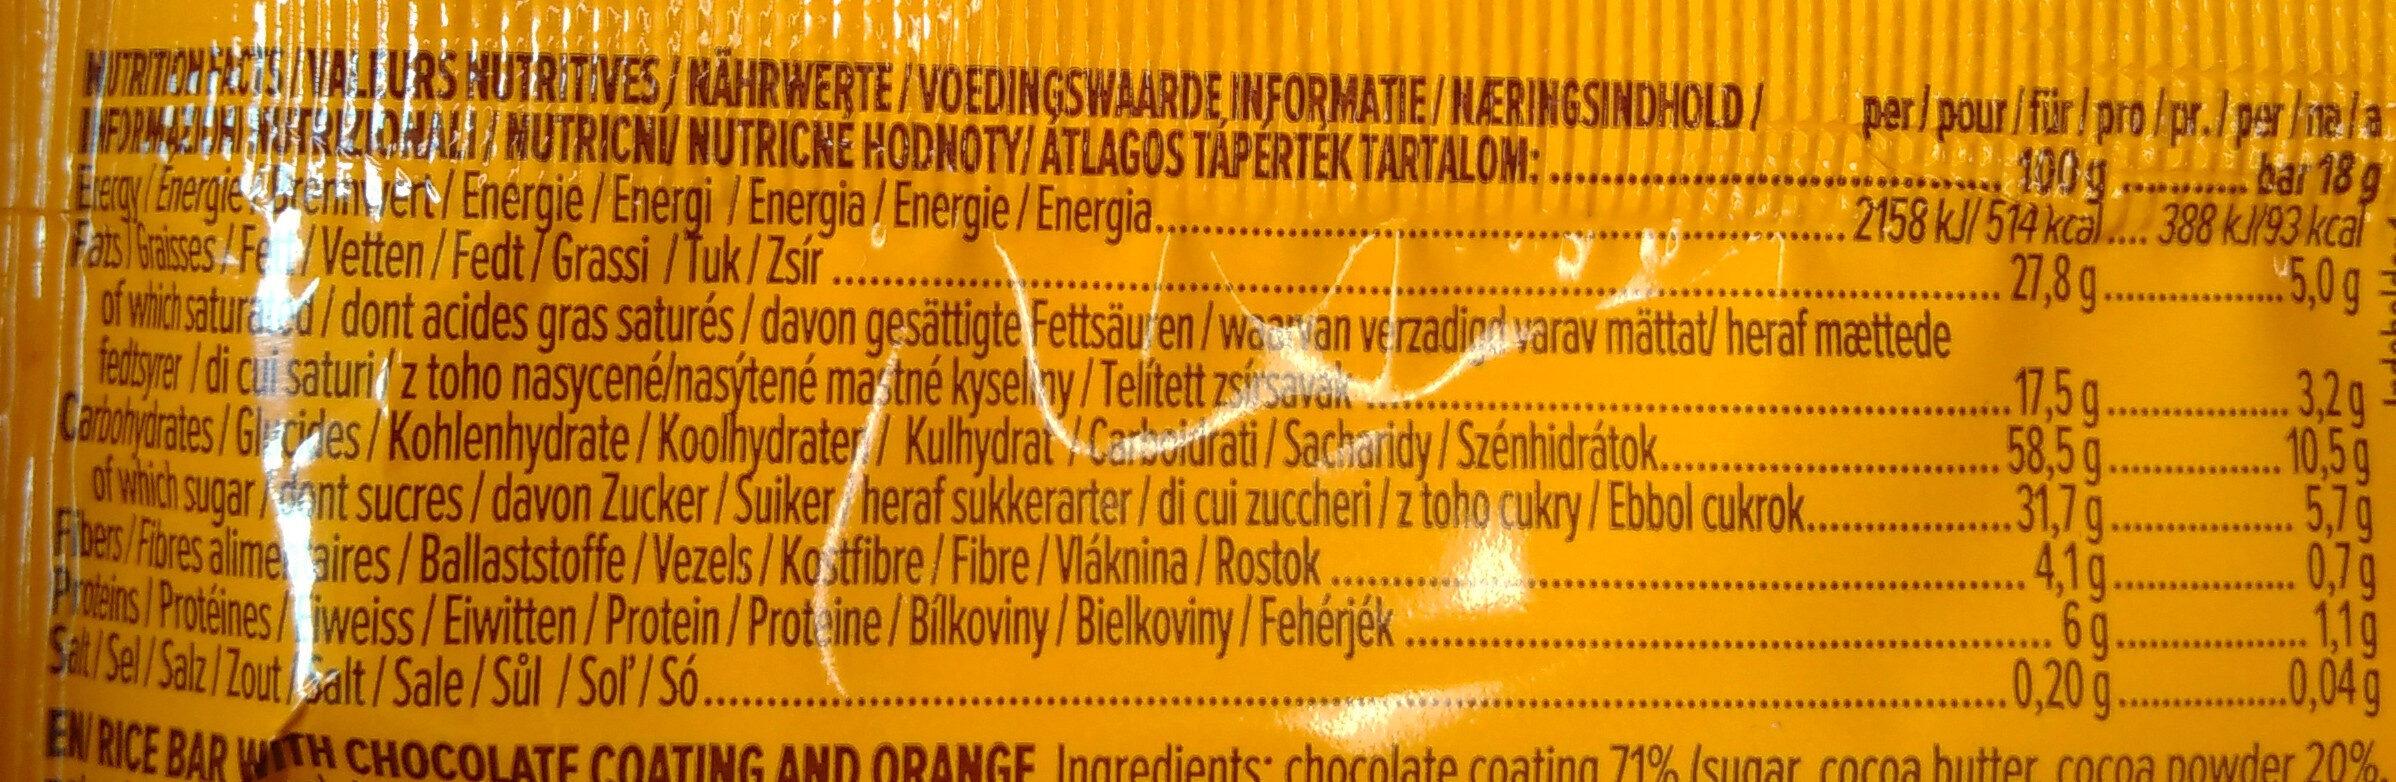 Rocky rice choco orange - Voedingswaarden - fr